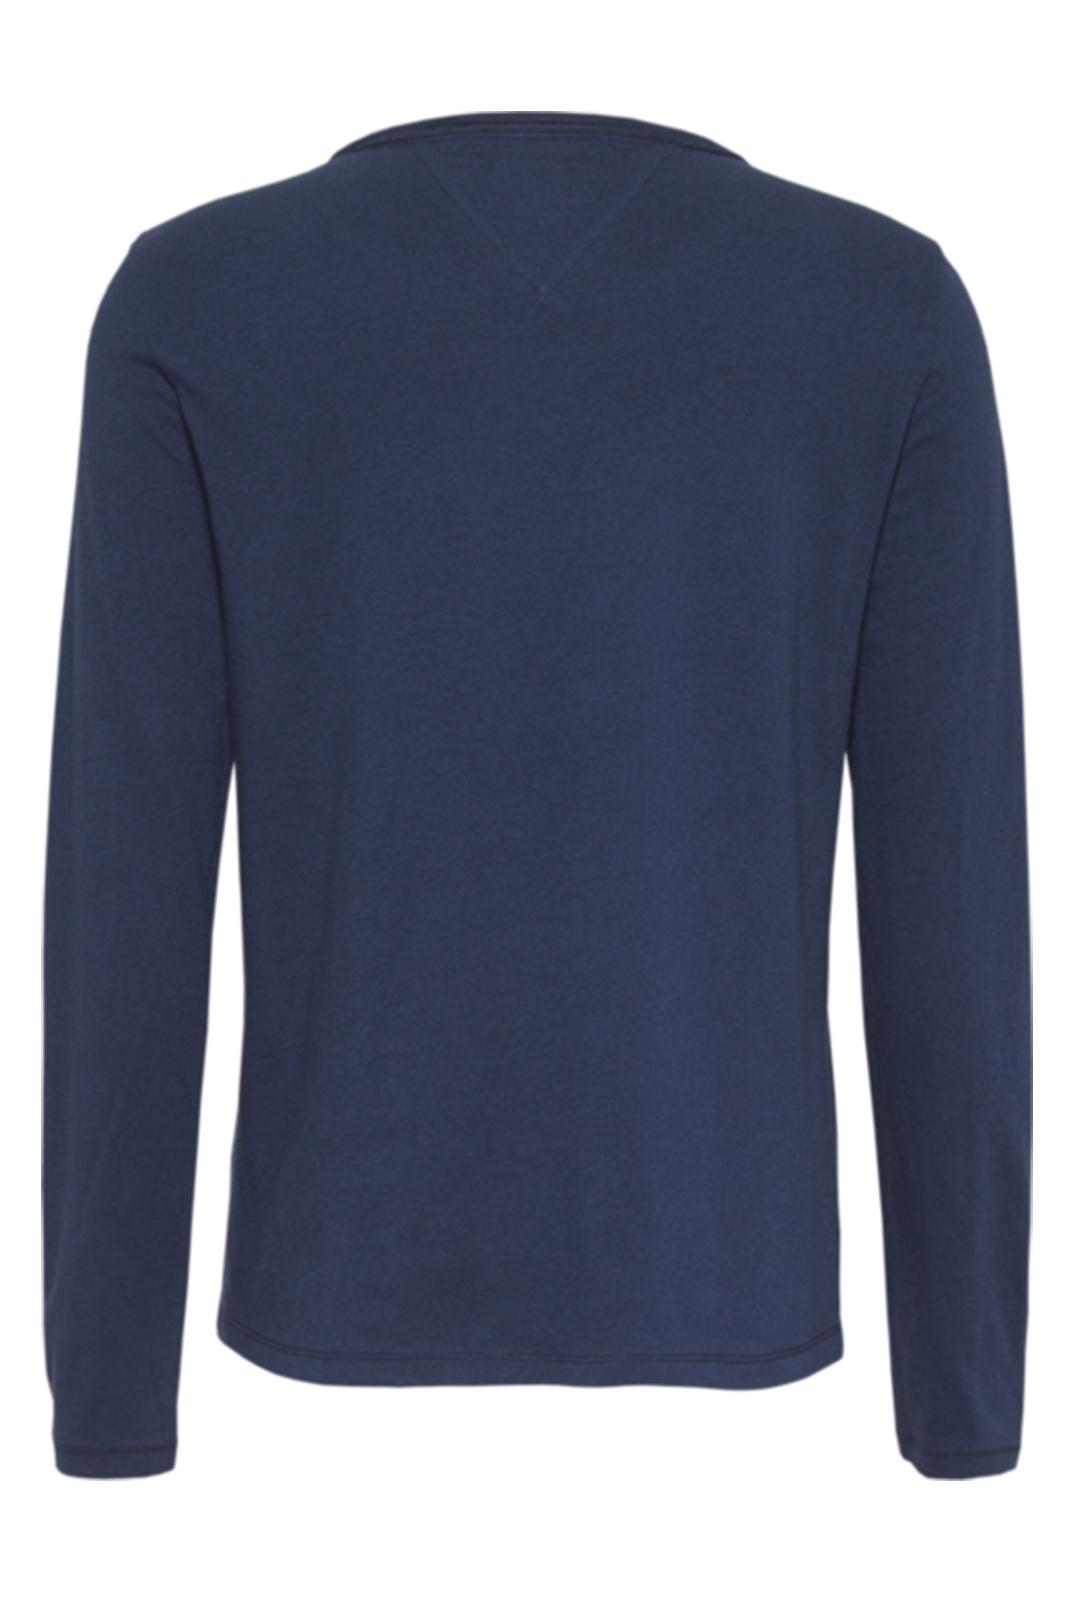 Tee shirt manches longues  Tommy Jeans DW0DW06900 002 BLACK IRIS